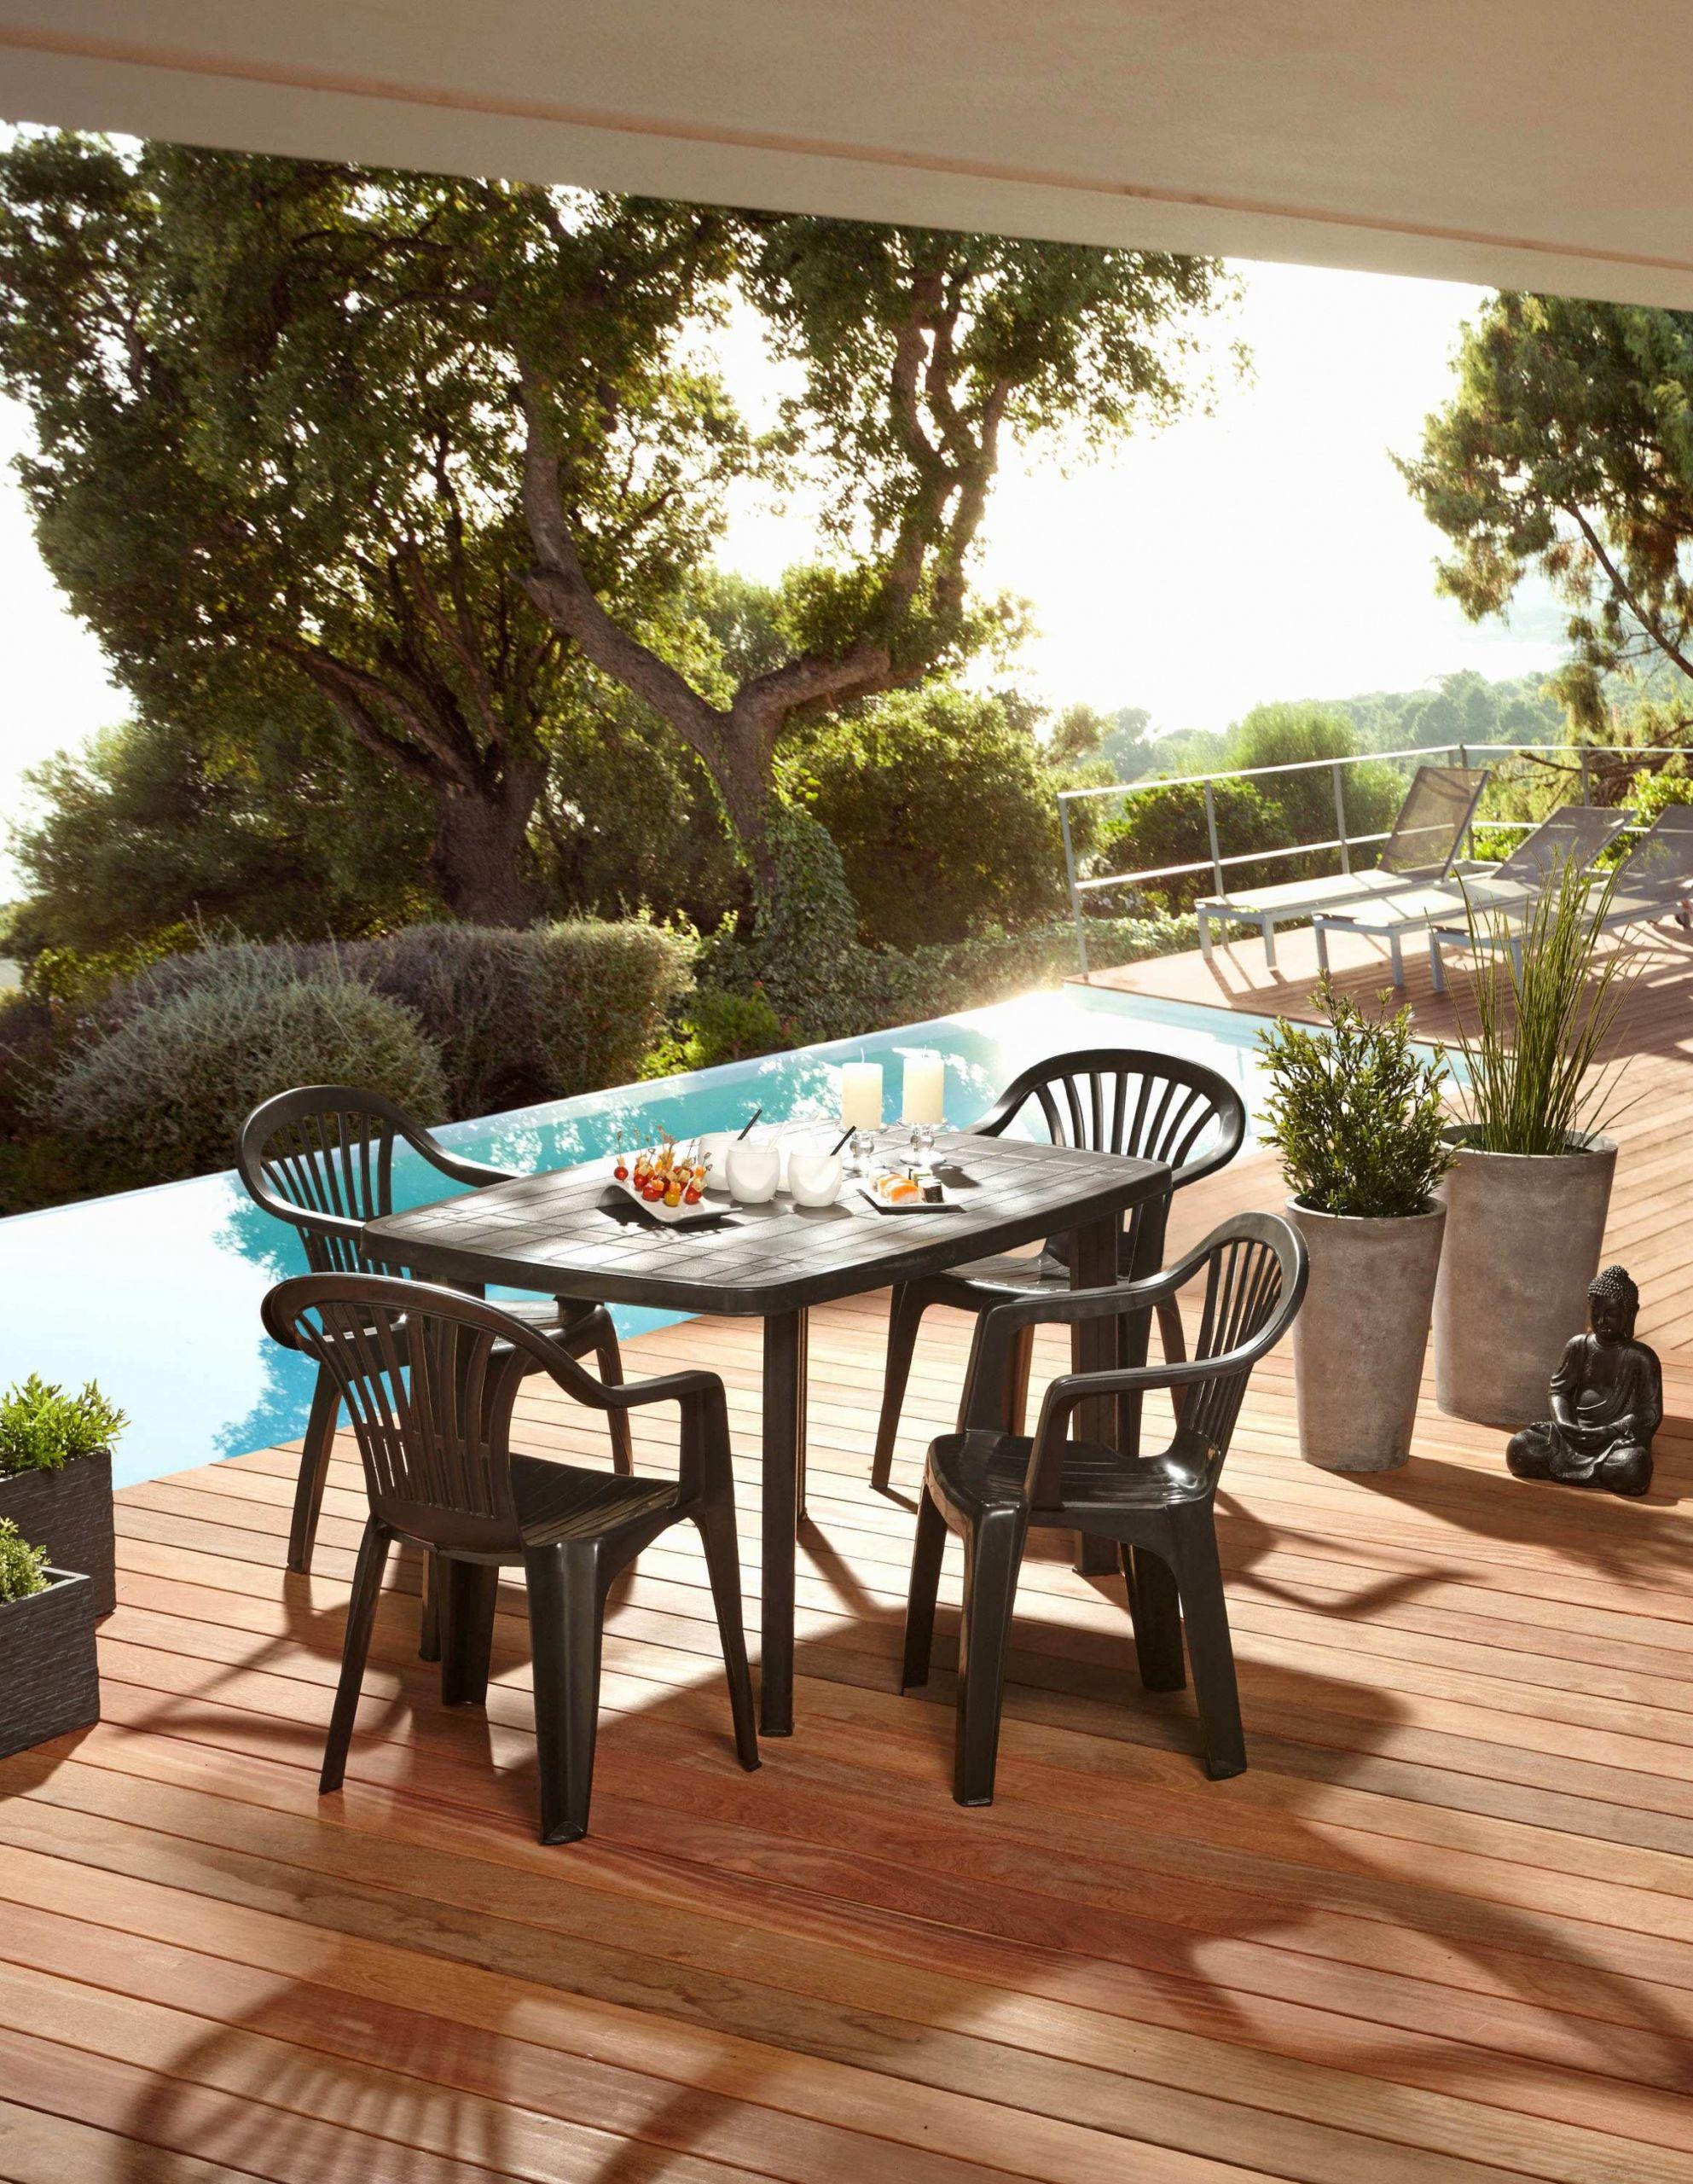 fotos de muebles de patio best idee palette salon de jardin gallery de muebles de jardin